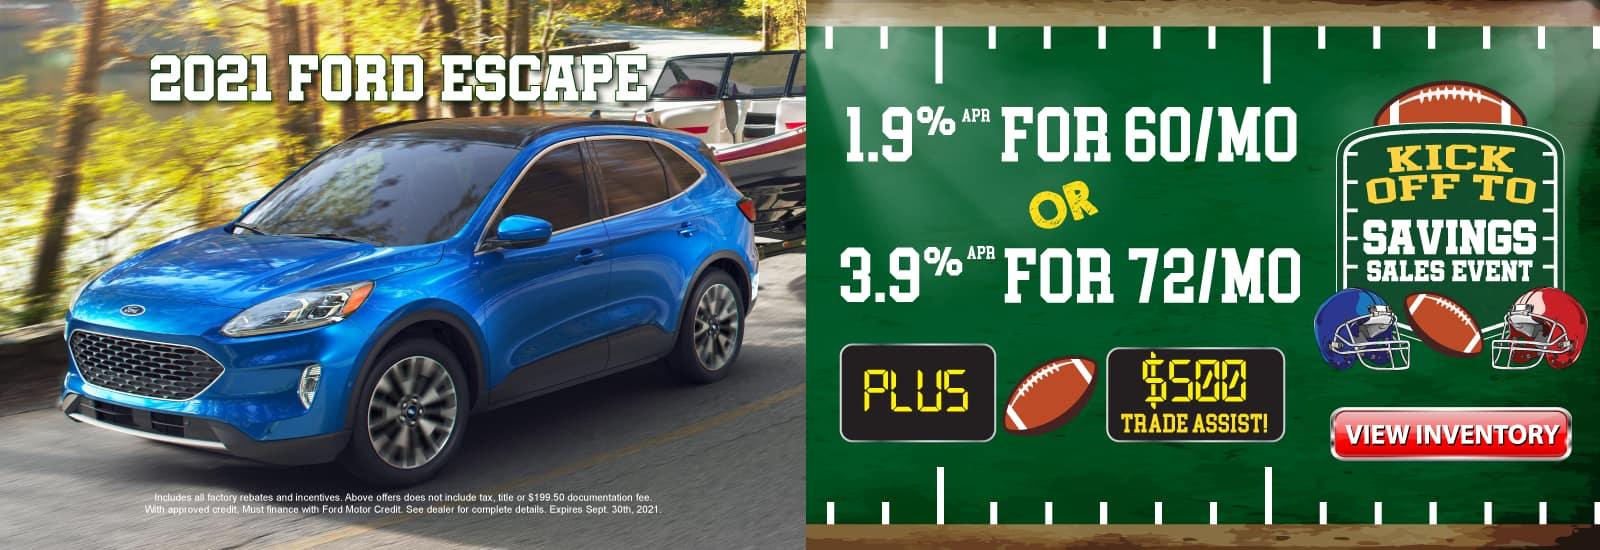 Sept2021-Ford-Escape-Web-Banner-1600×550